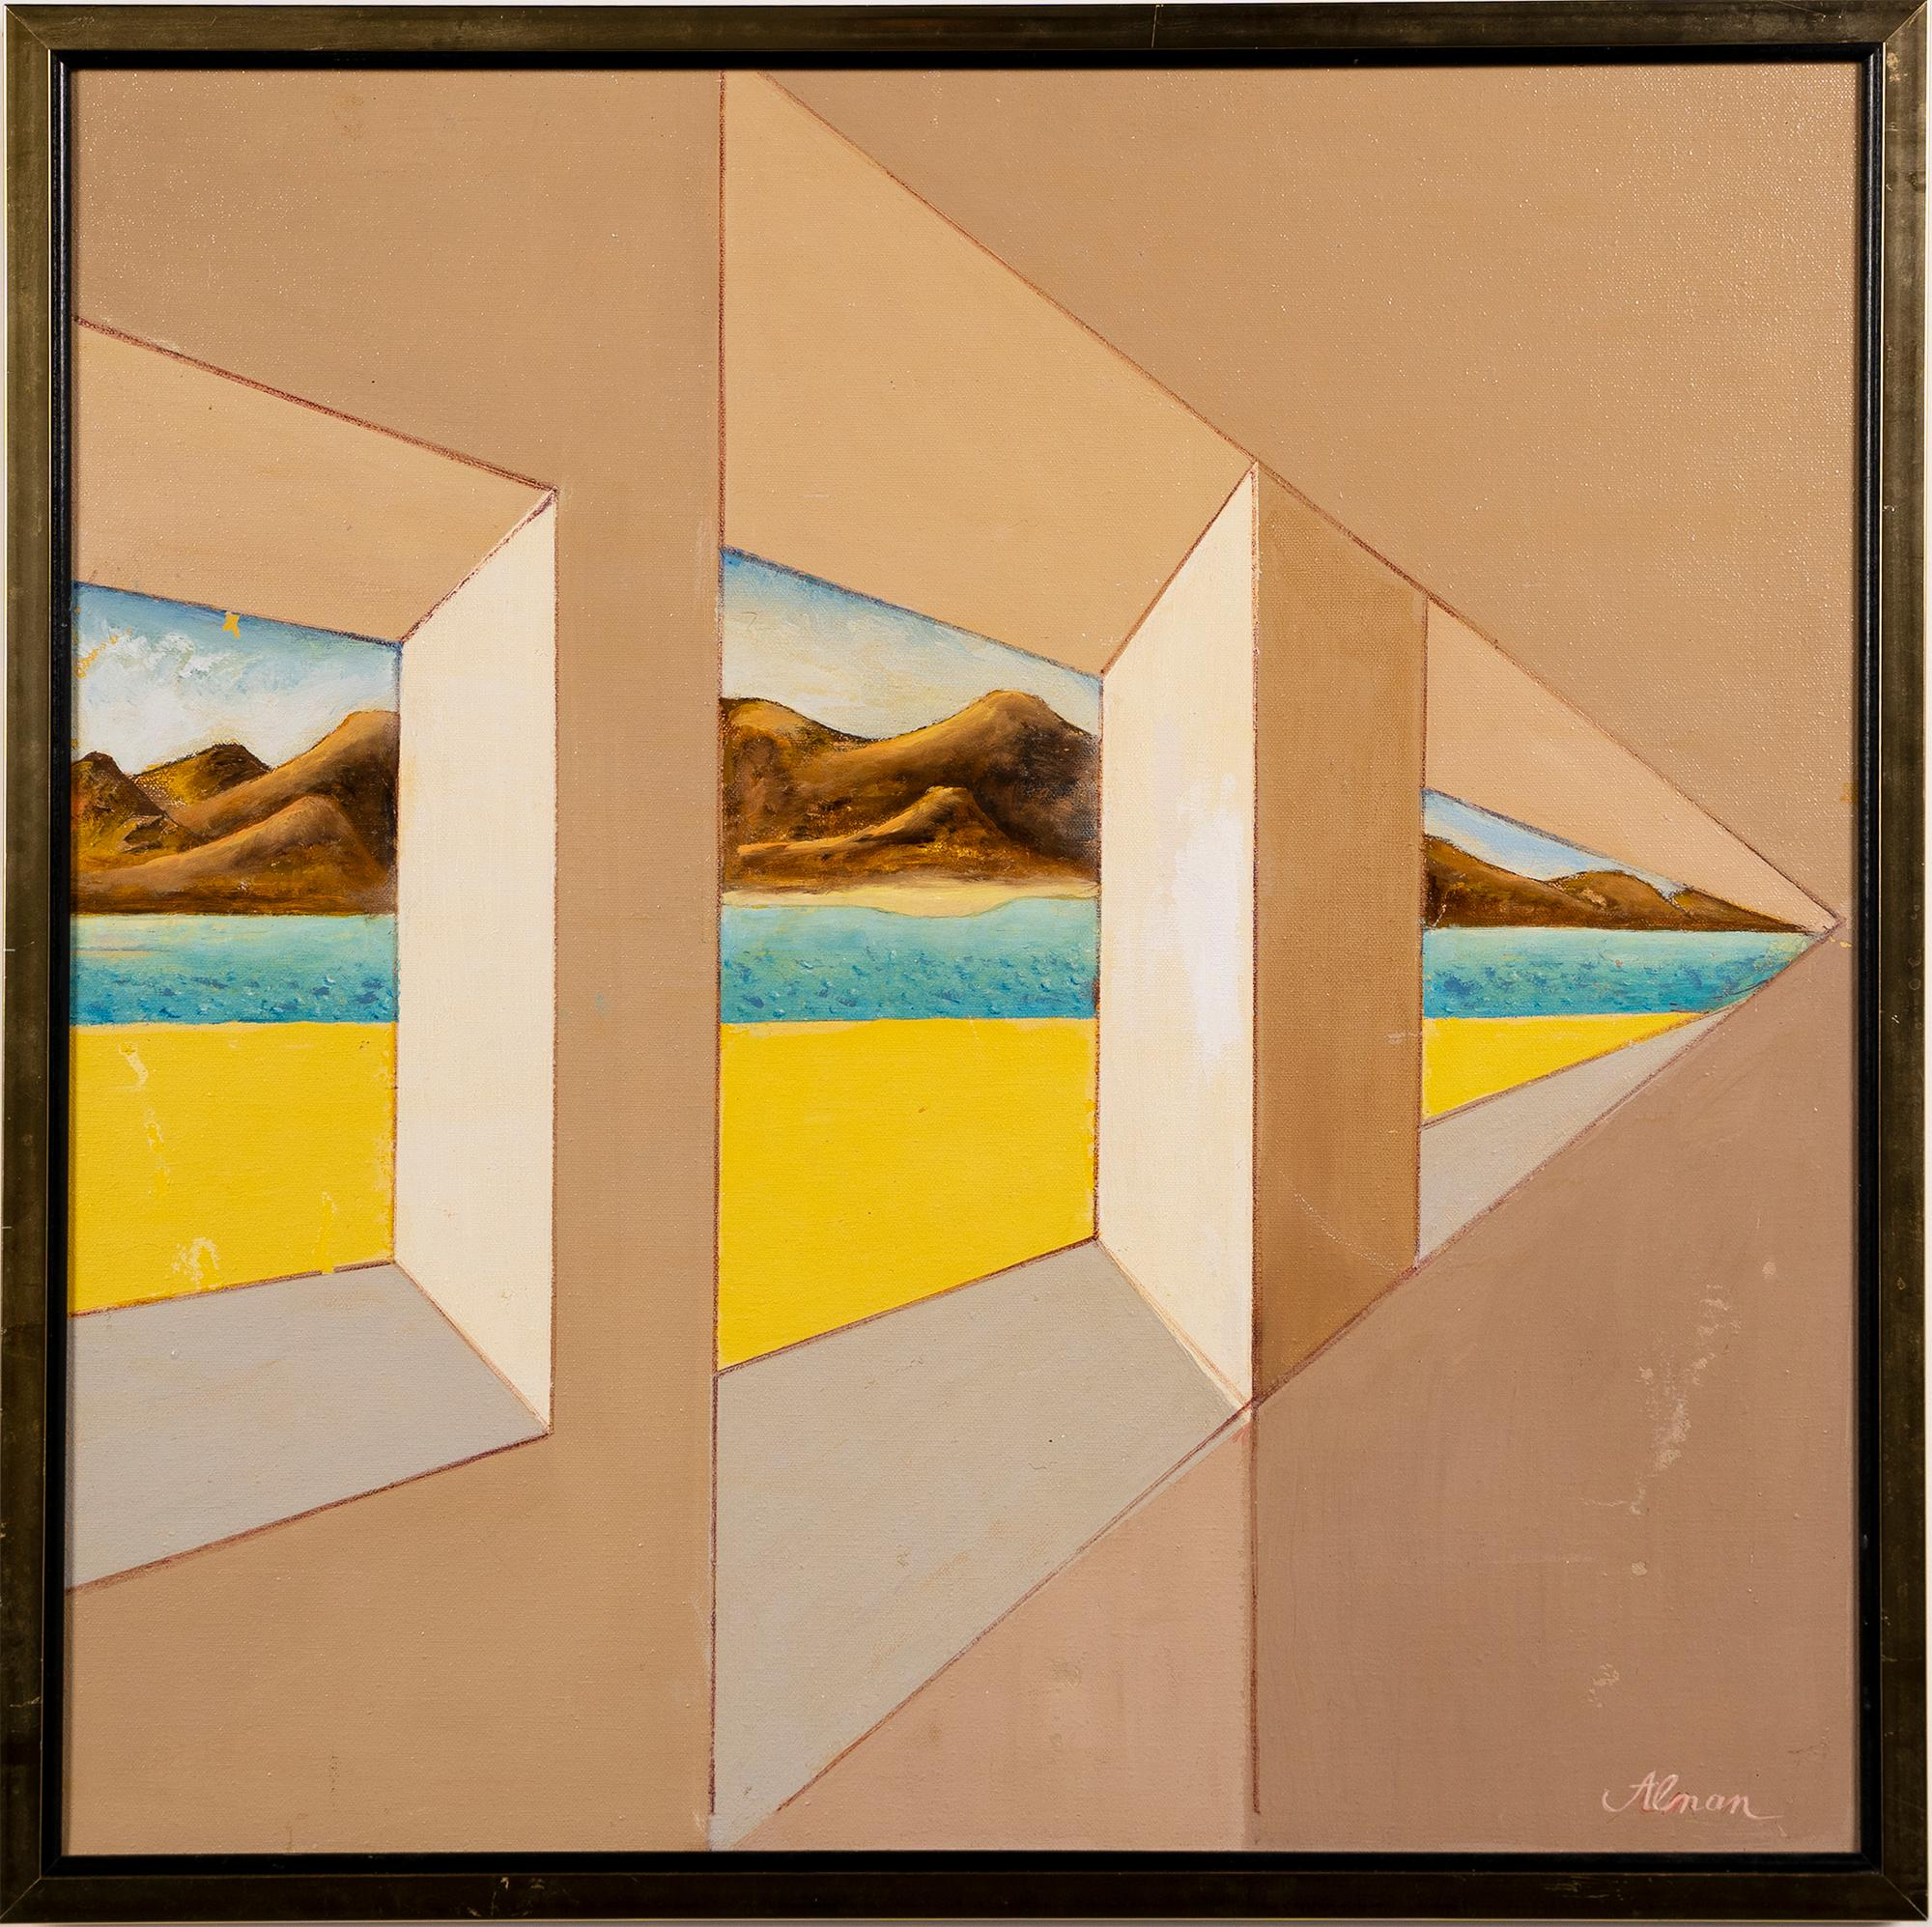 Vintage American Pop Art Trompe L'oeil Window Opening Beach Abstract Painting